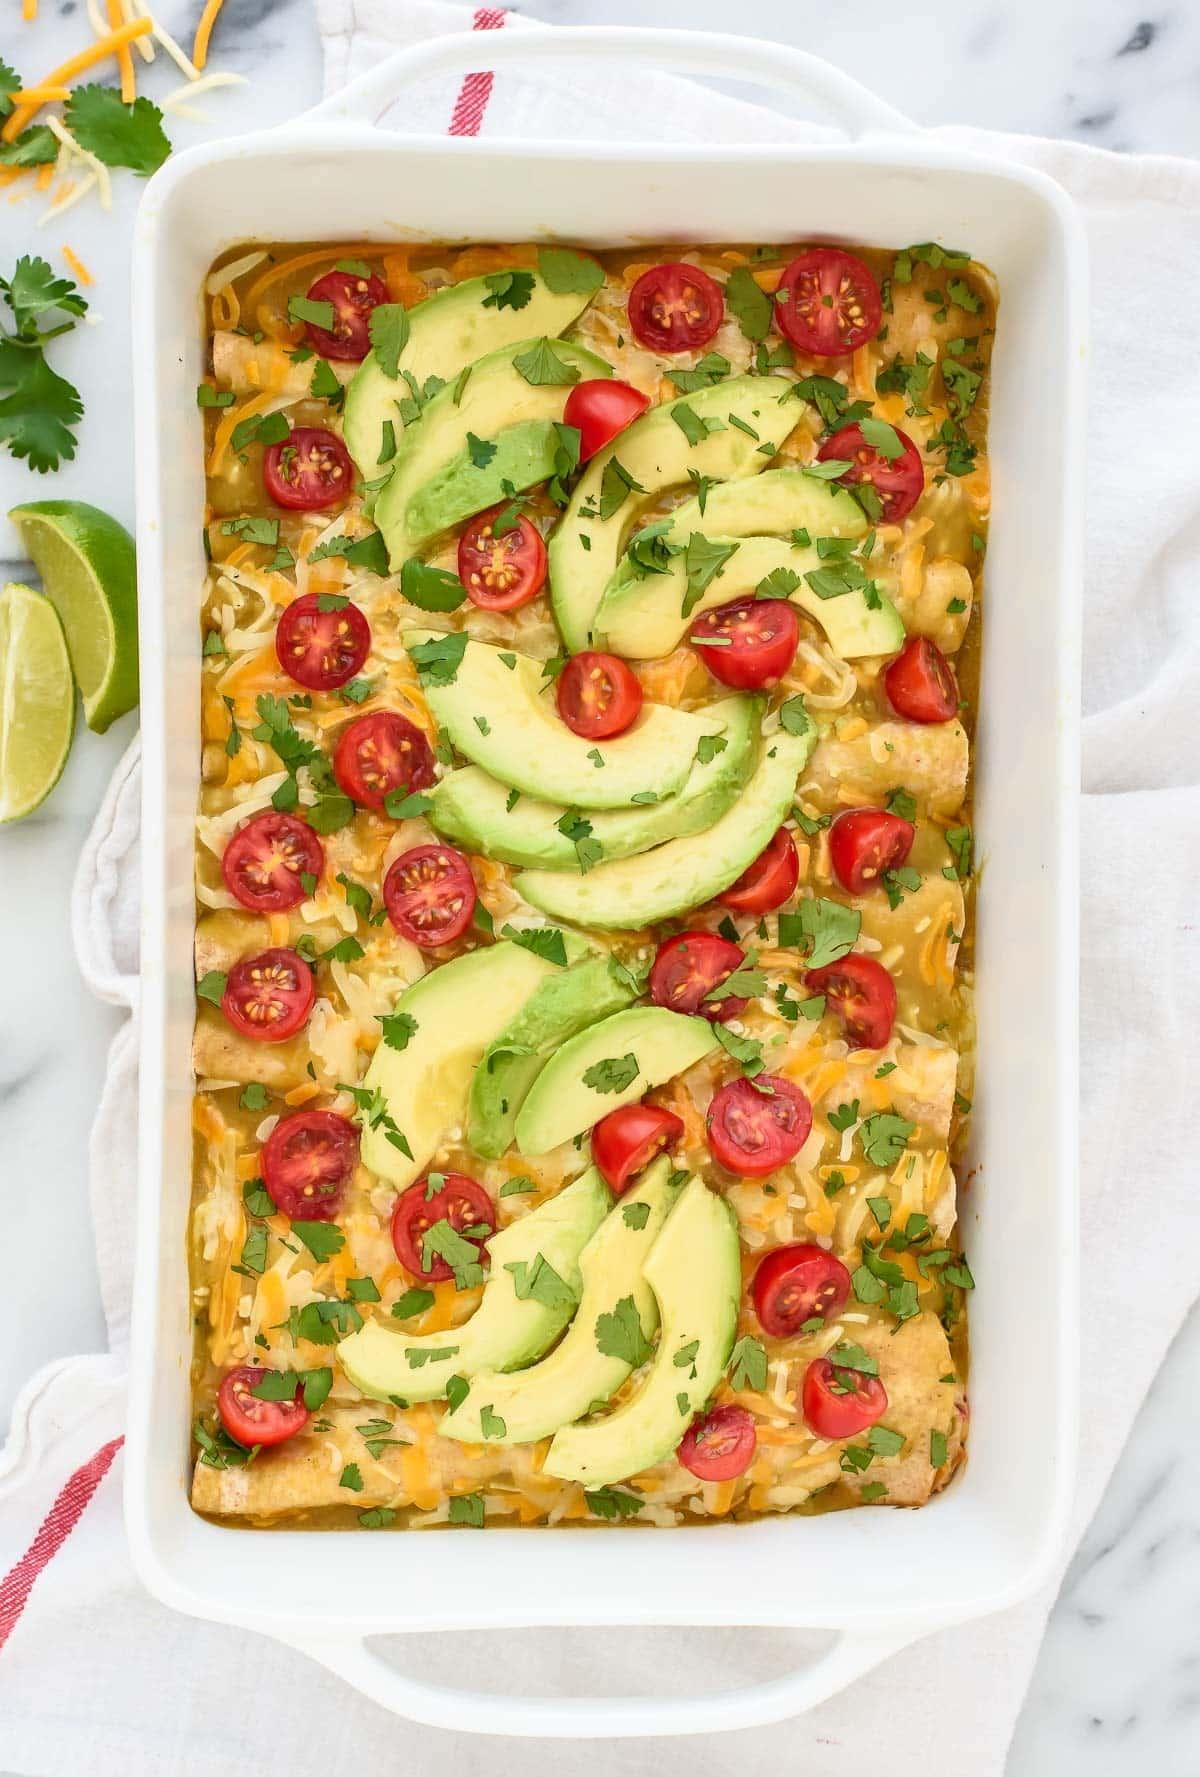 Creamy Green Chile Chicken Enchiladas. A simple and healthy recipe!